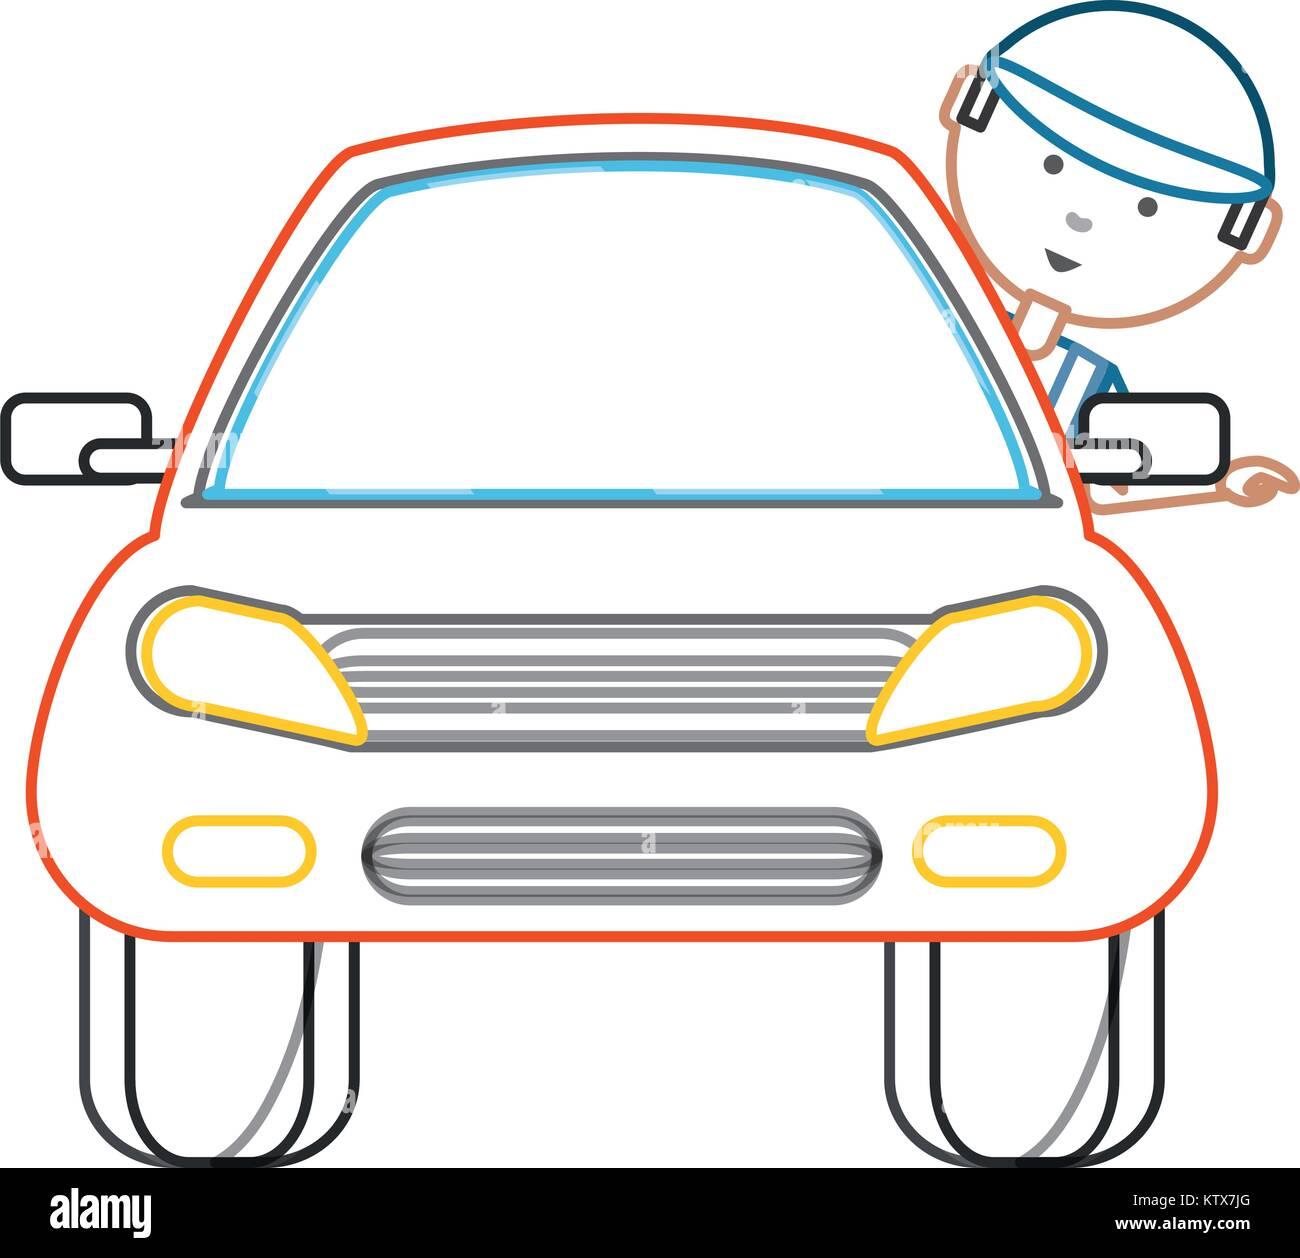 cartoon mechanic and car icon - Stock Vector